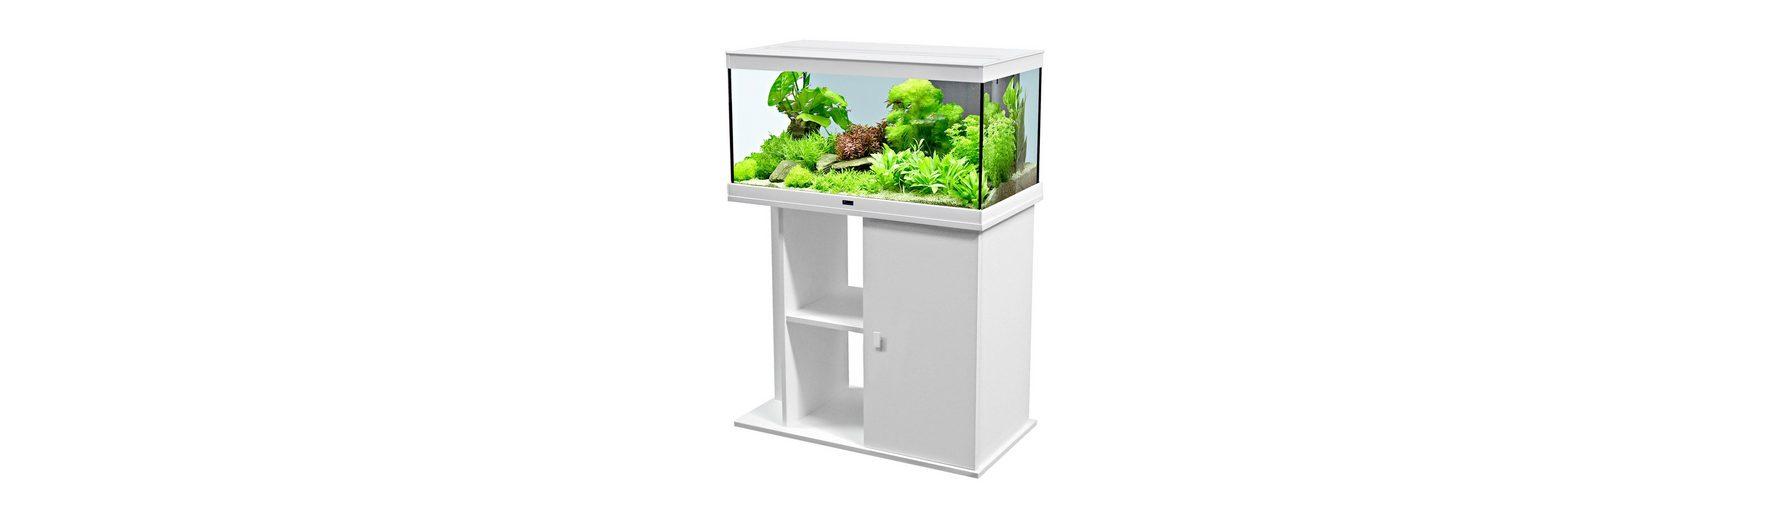 Aquarien-Set »Style 80 LED«, weiß (B/T/H: 80/35/40 cm)